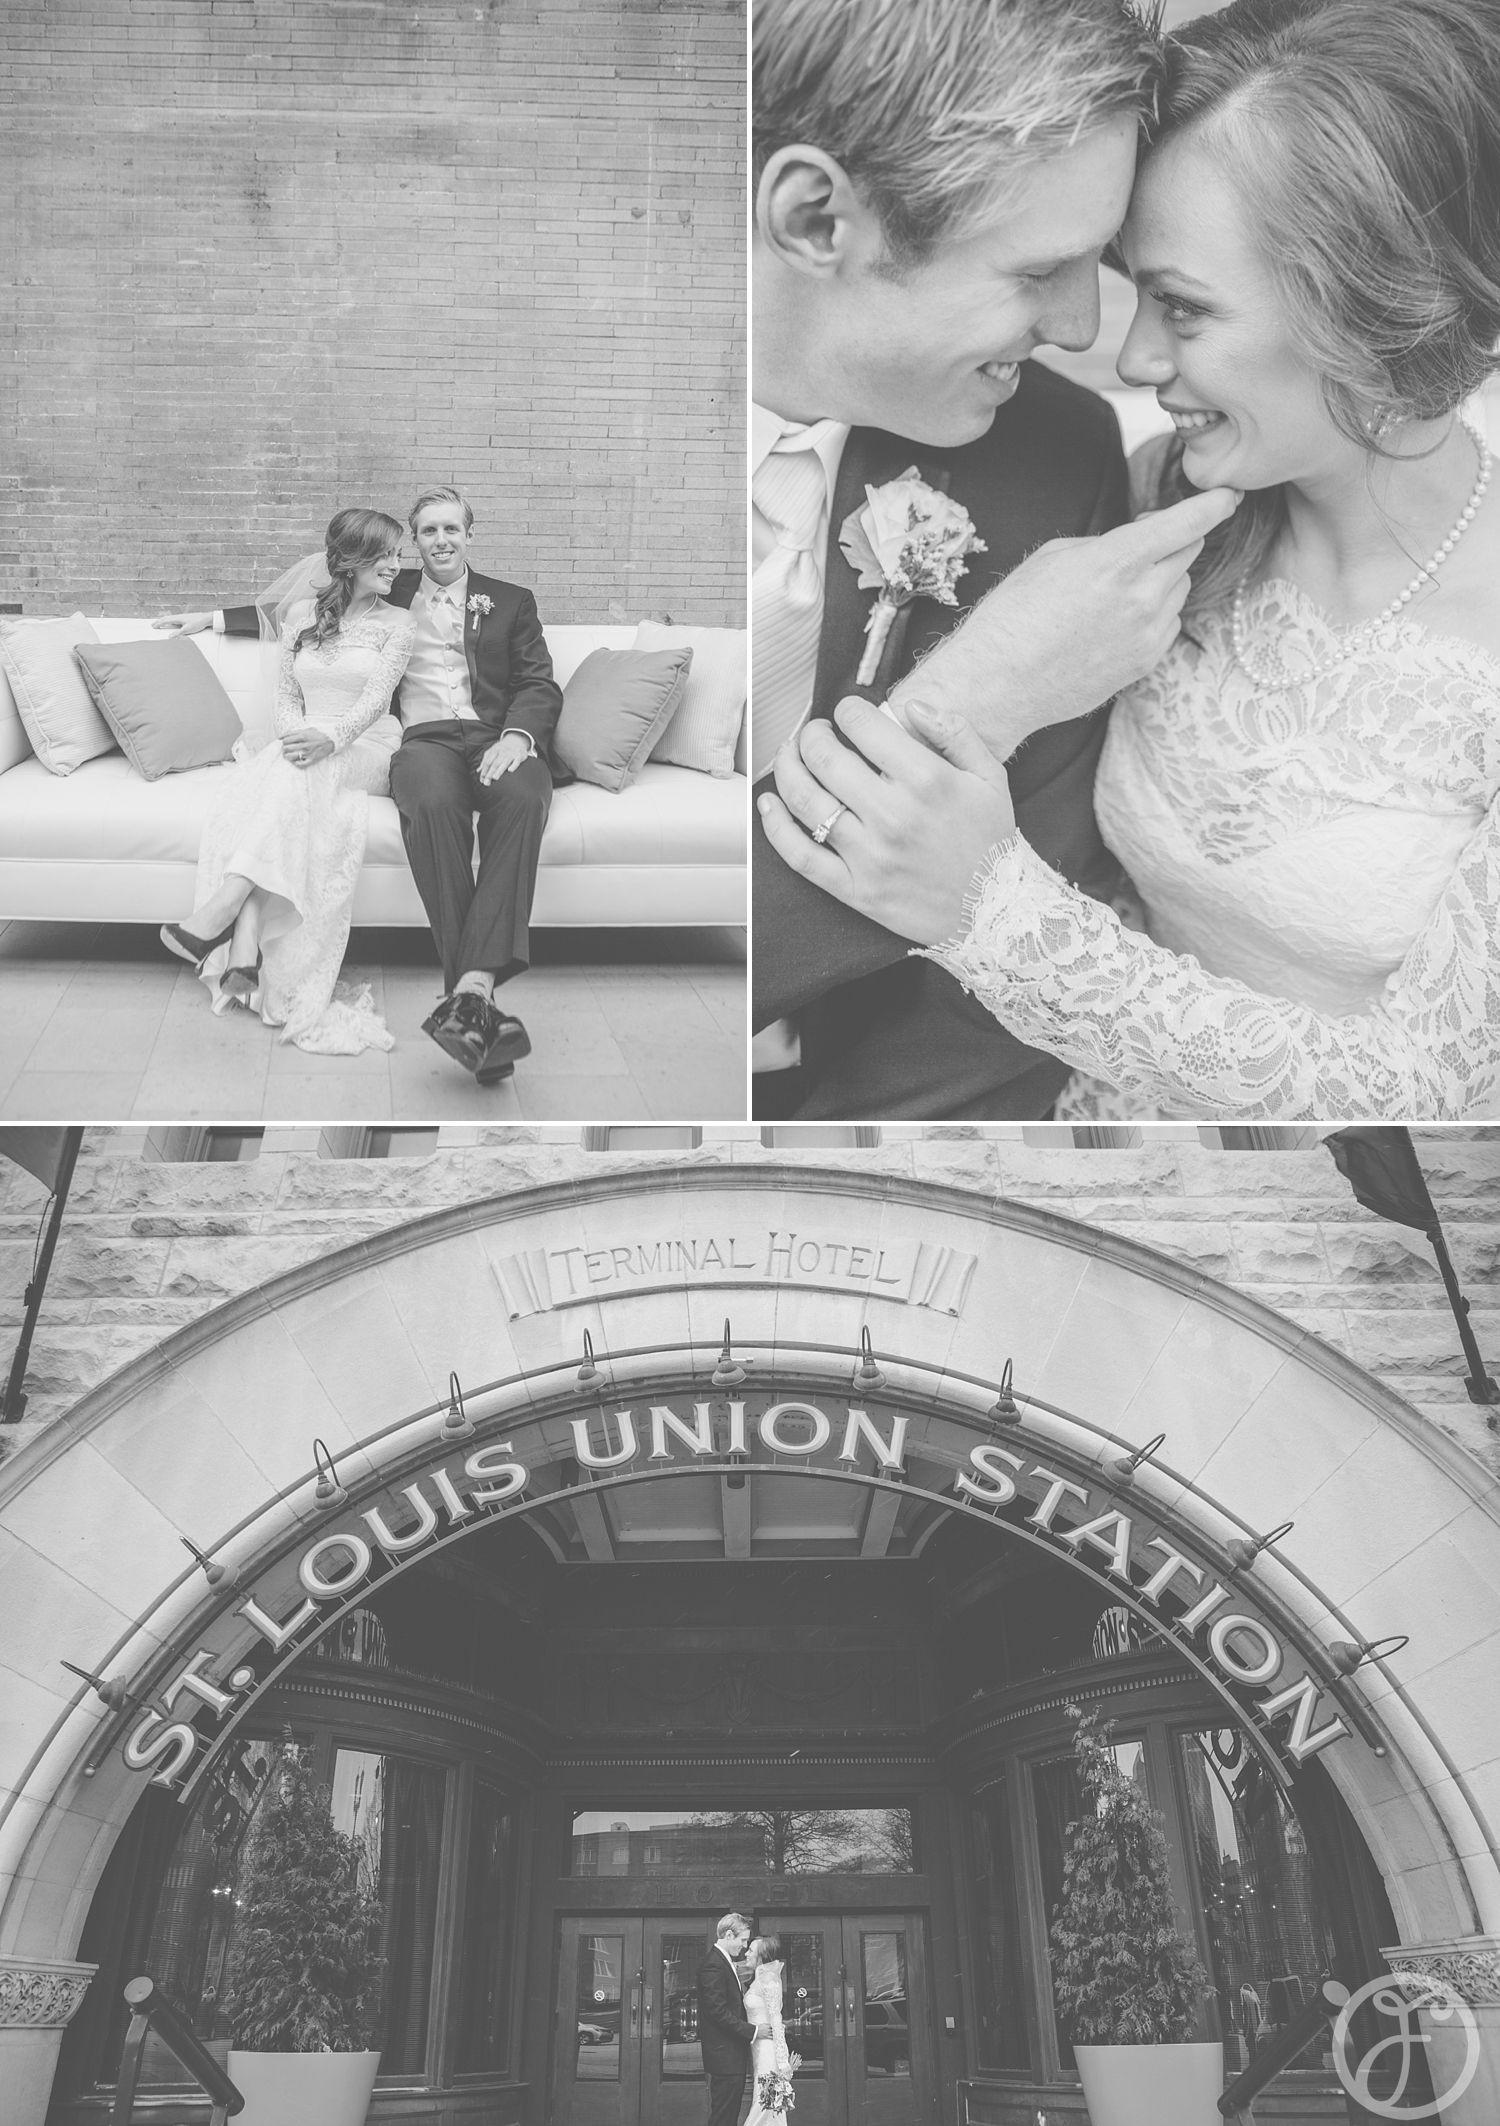 winter wedding photos, union station, st louis wedding photographers